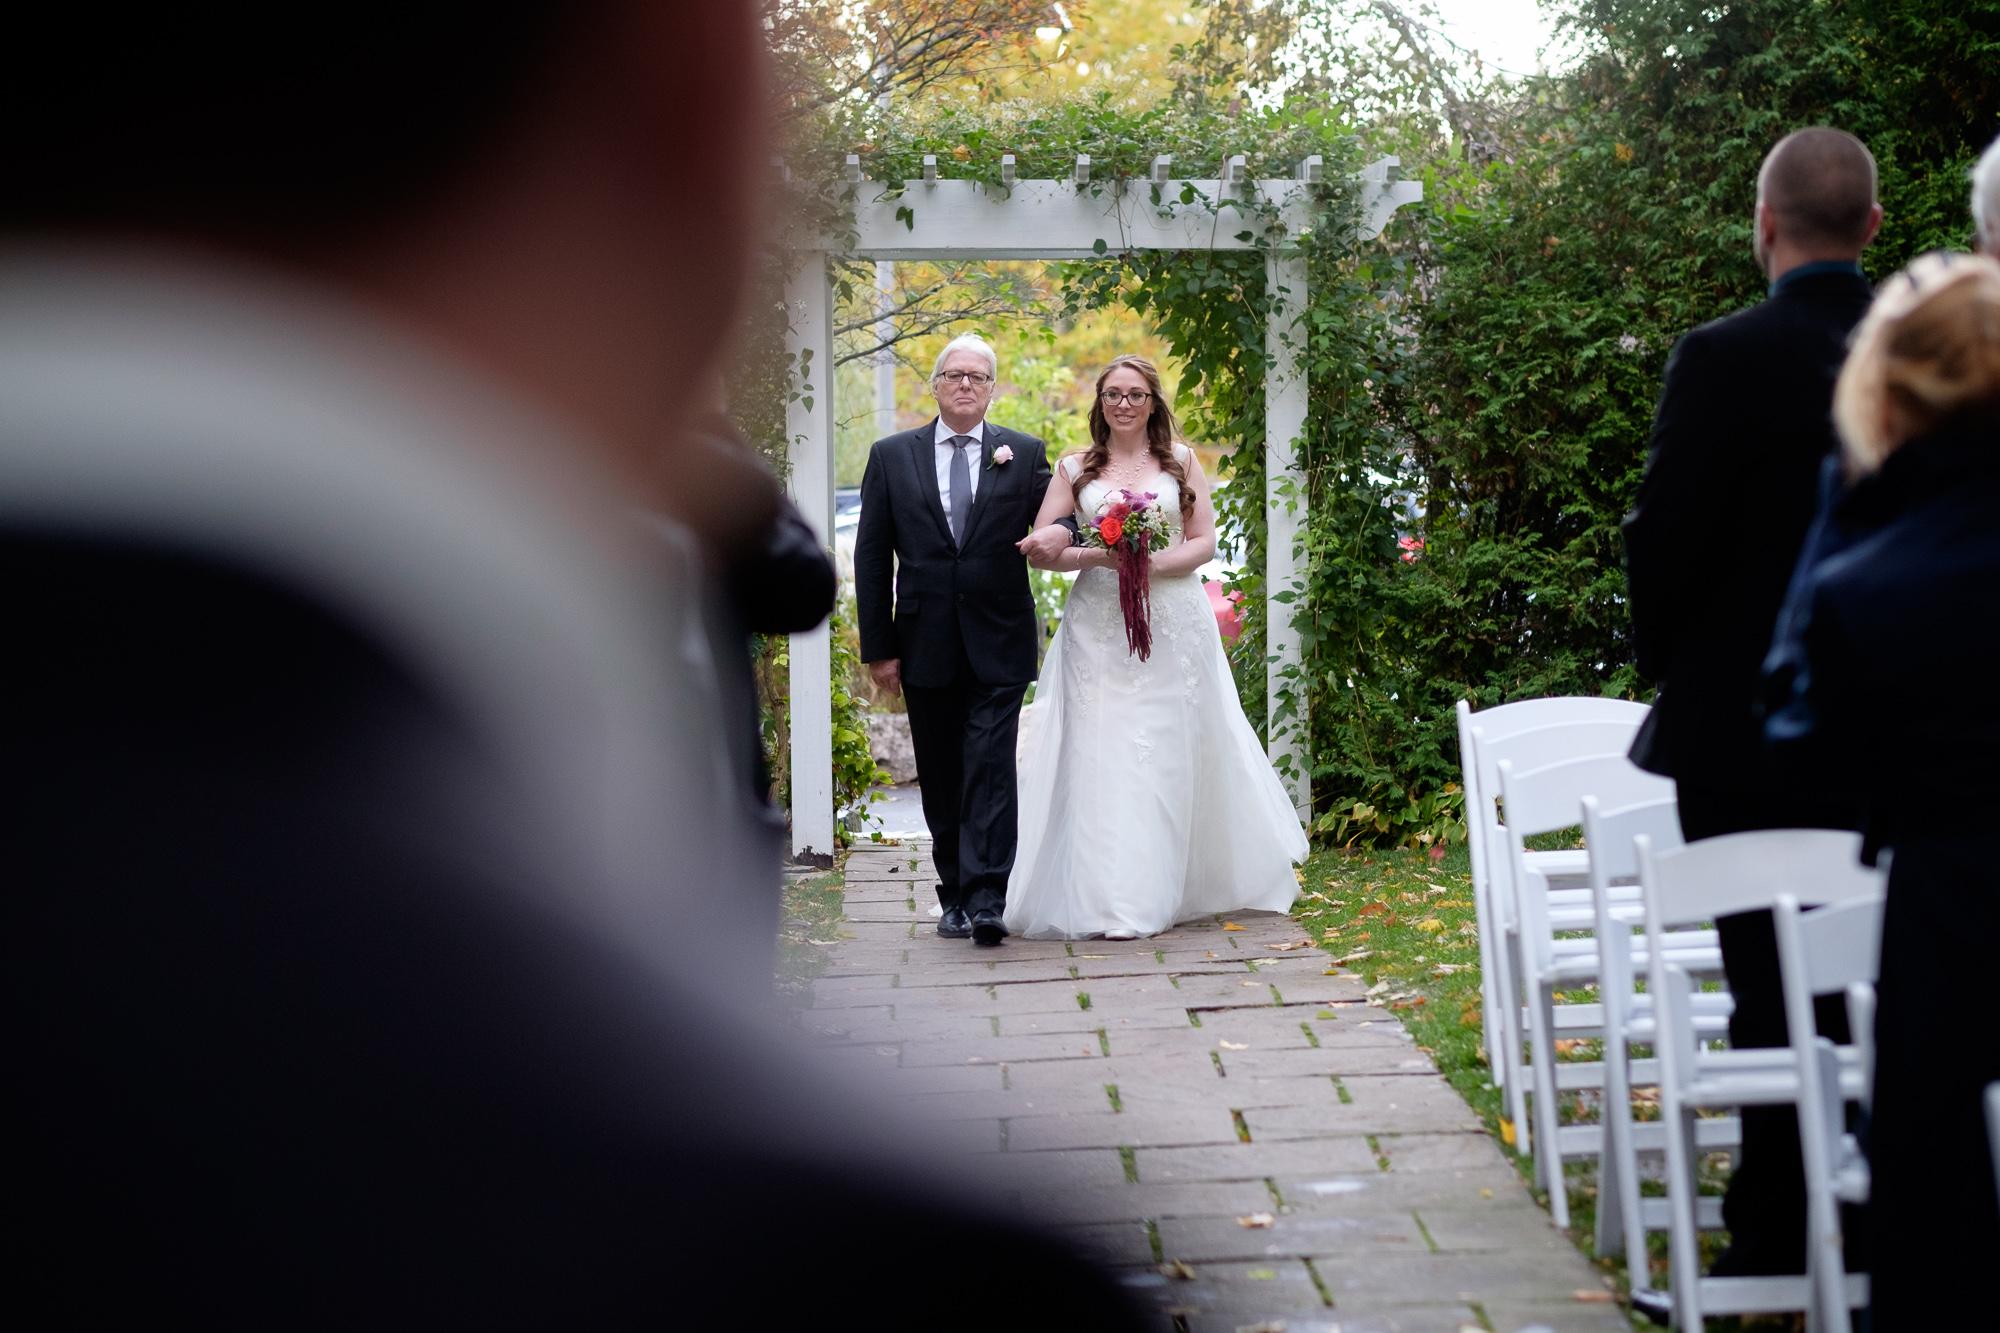 ancaster-mill-wedding-photograph-005.jpg